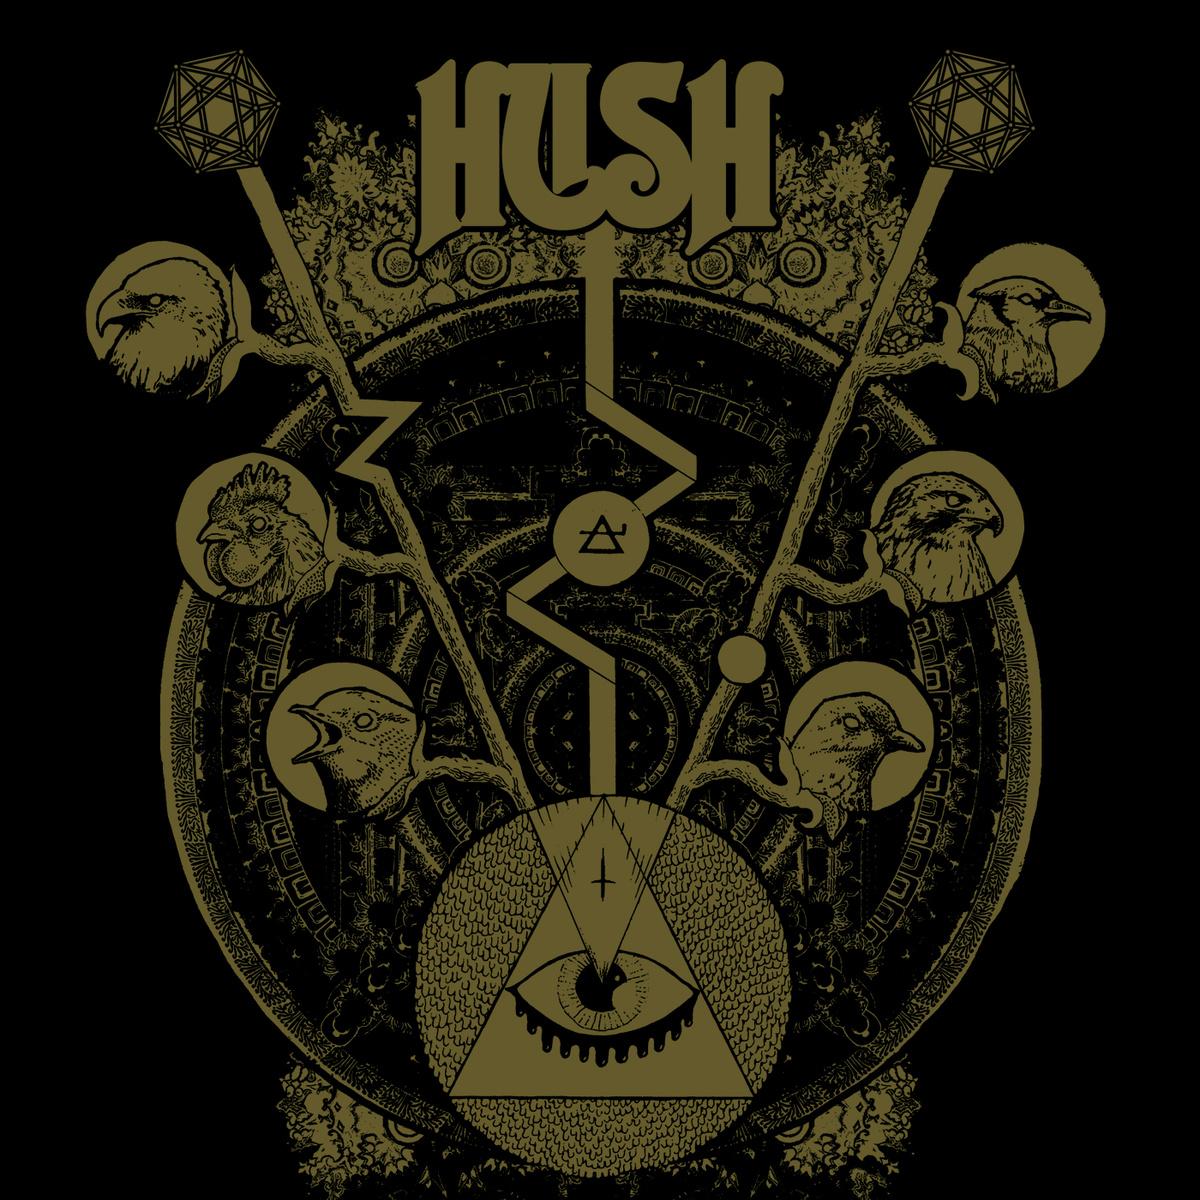 HUSH picture